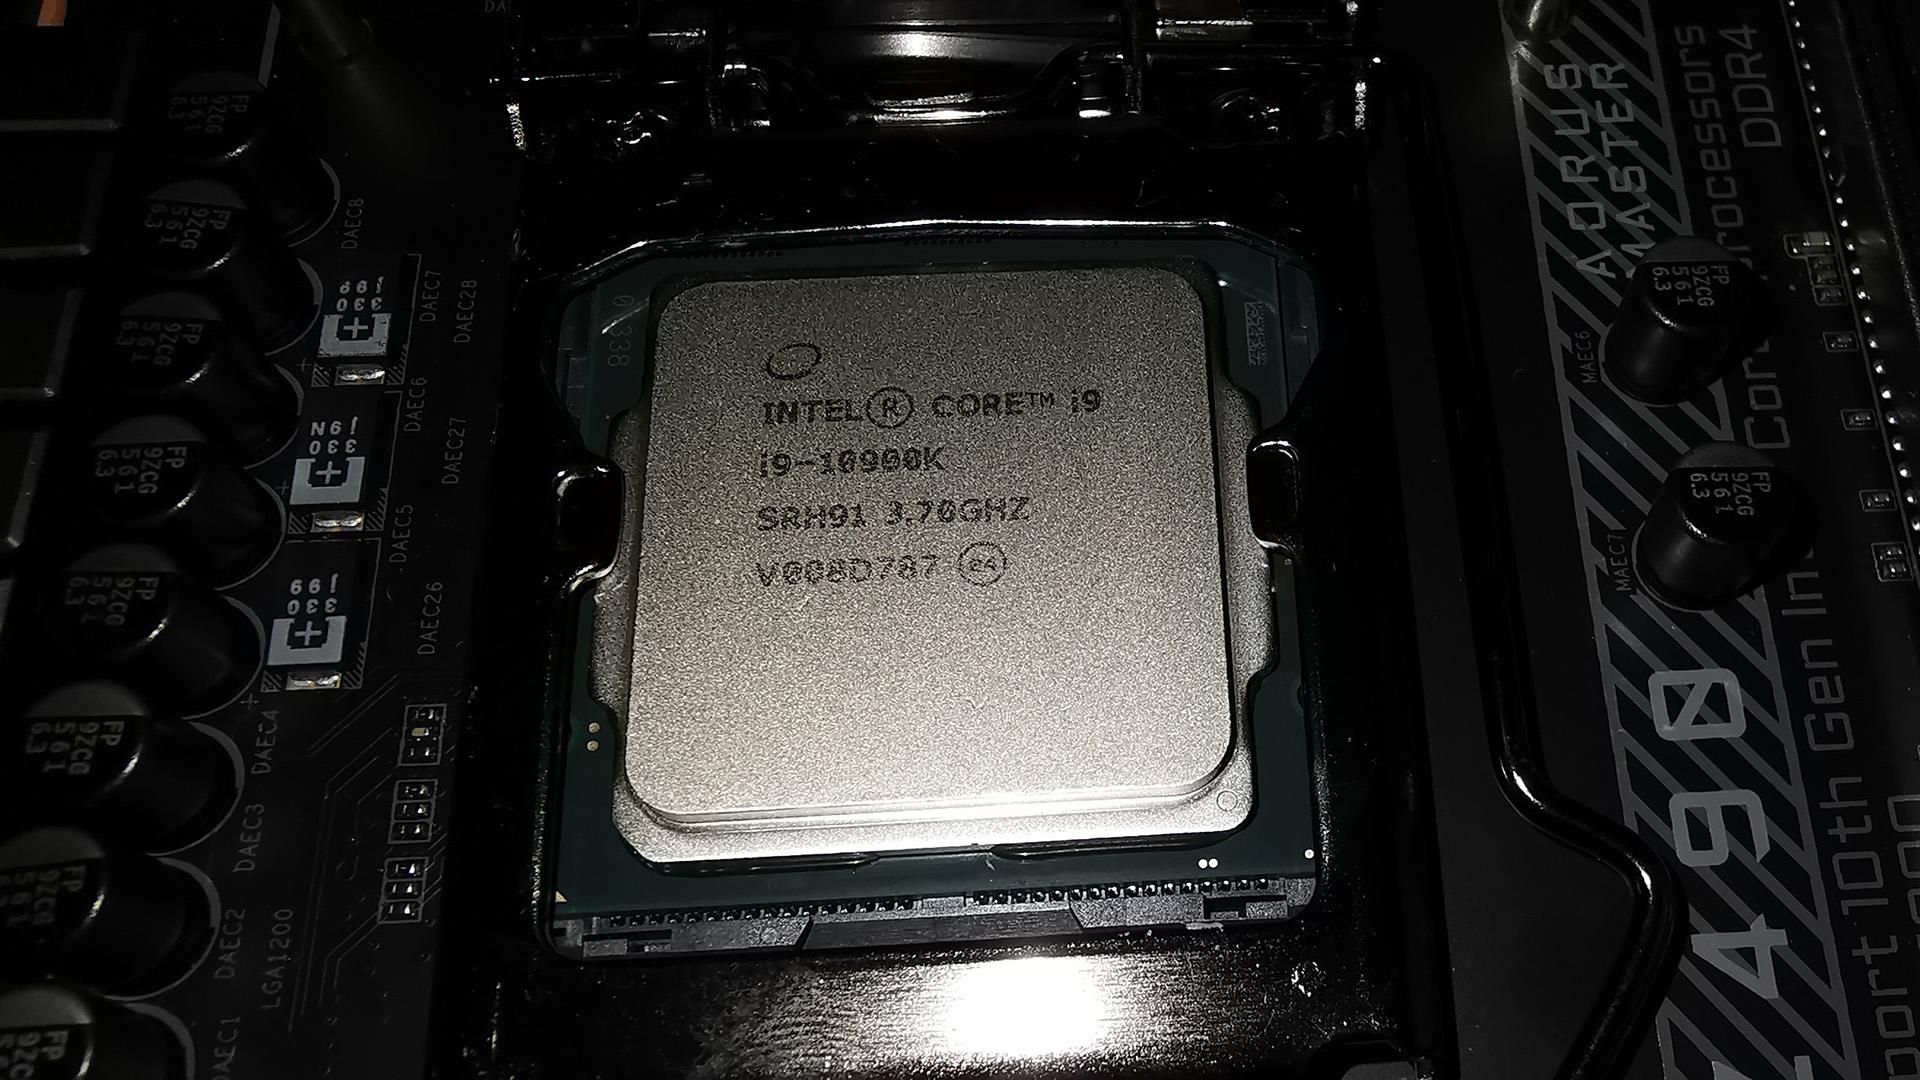 Intel i9 and i5 CPUs